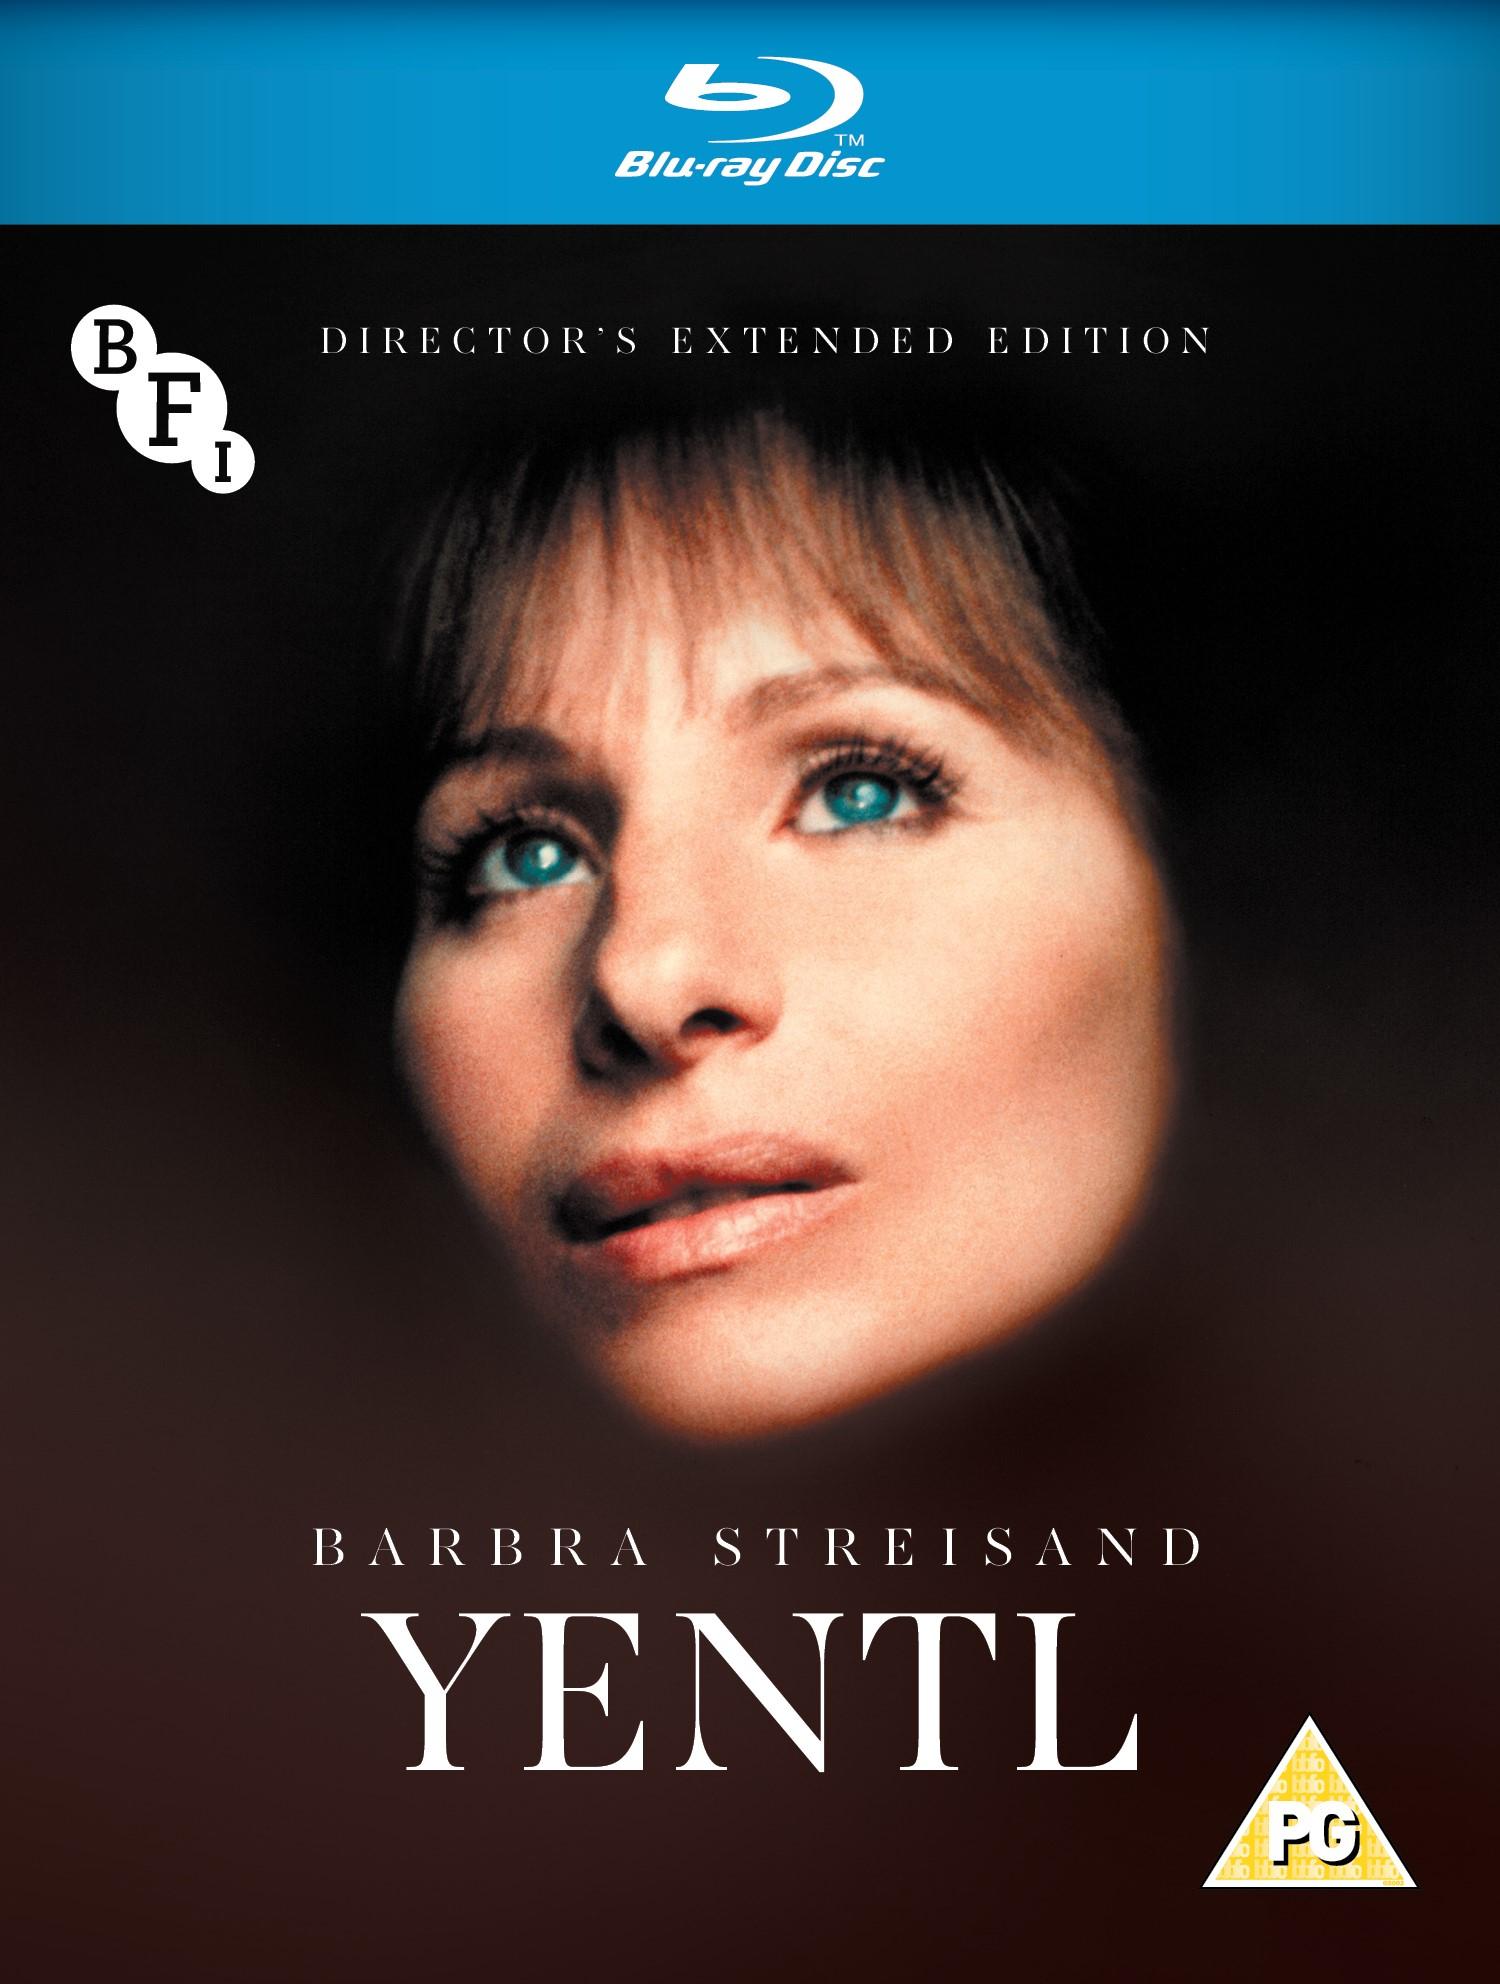 Buy PRE-ORDER Yentl (2-disc Blu-ray / DVD set)